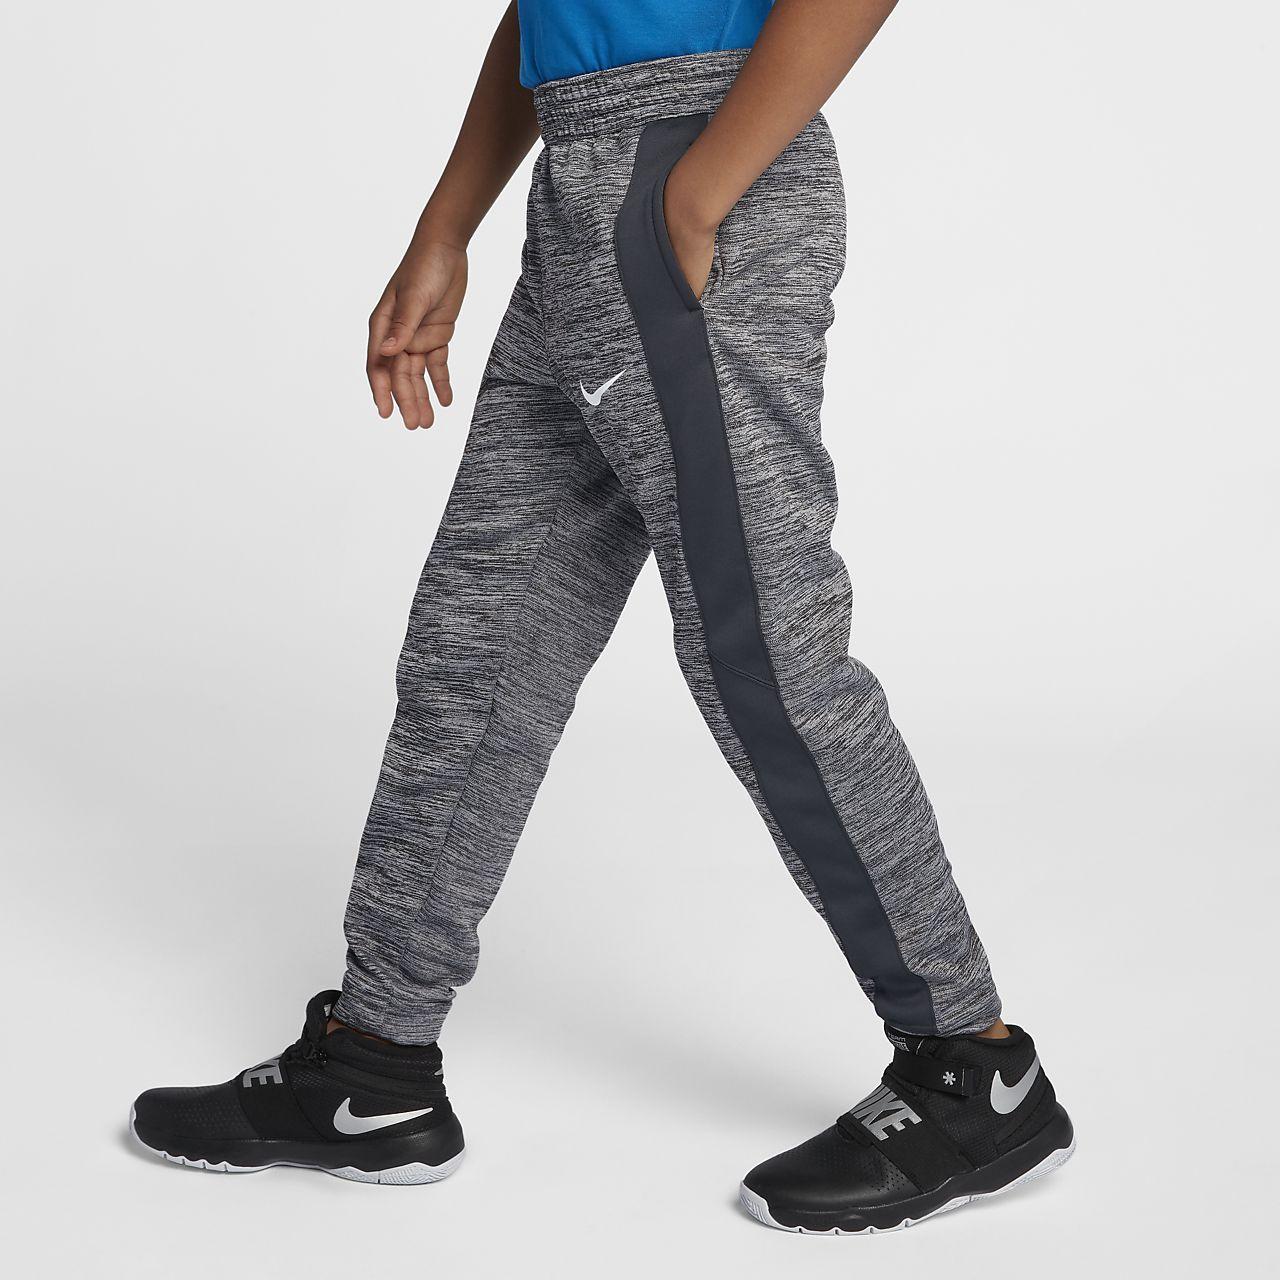 Nike Therma Big Kids  (Boys ) Basketball Pants. Nike.com 5a1c483de